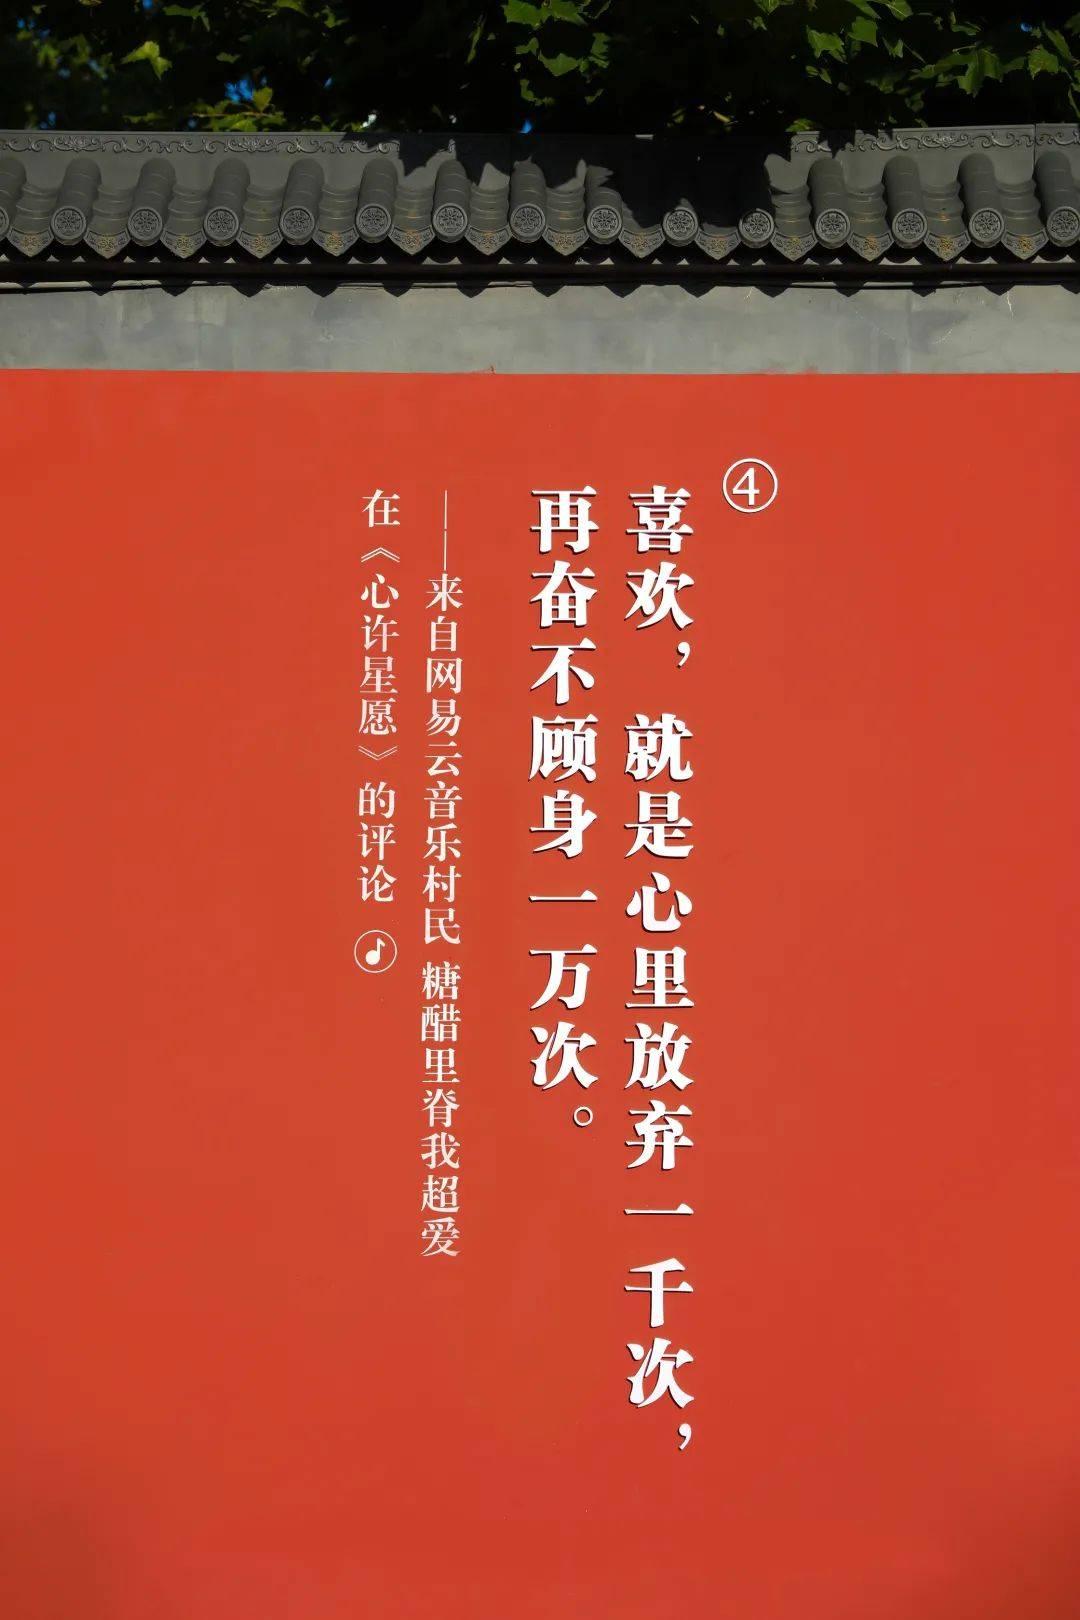 315328316141aa9fbb5e56.66380398 - 网易云音乐,一本情感营销的教科书